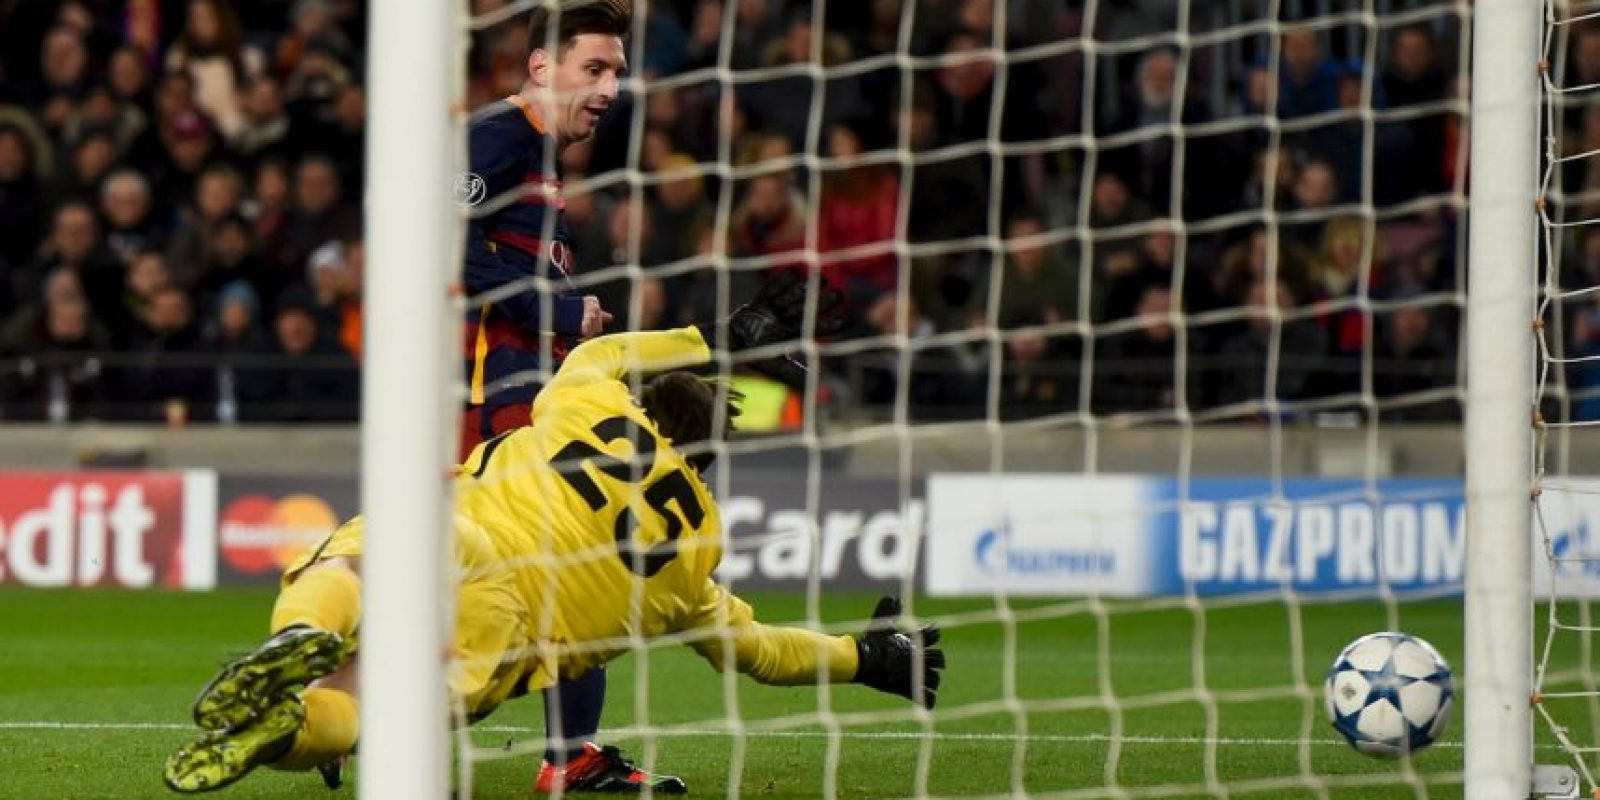 Fue parte del histórico sextete que consiguió Barcelona en 2009 Foto:Getty Images